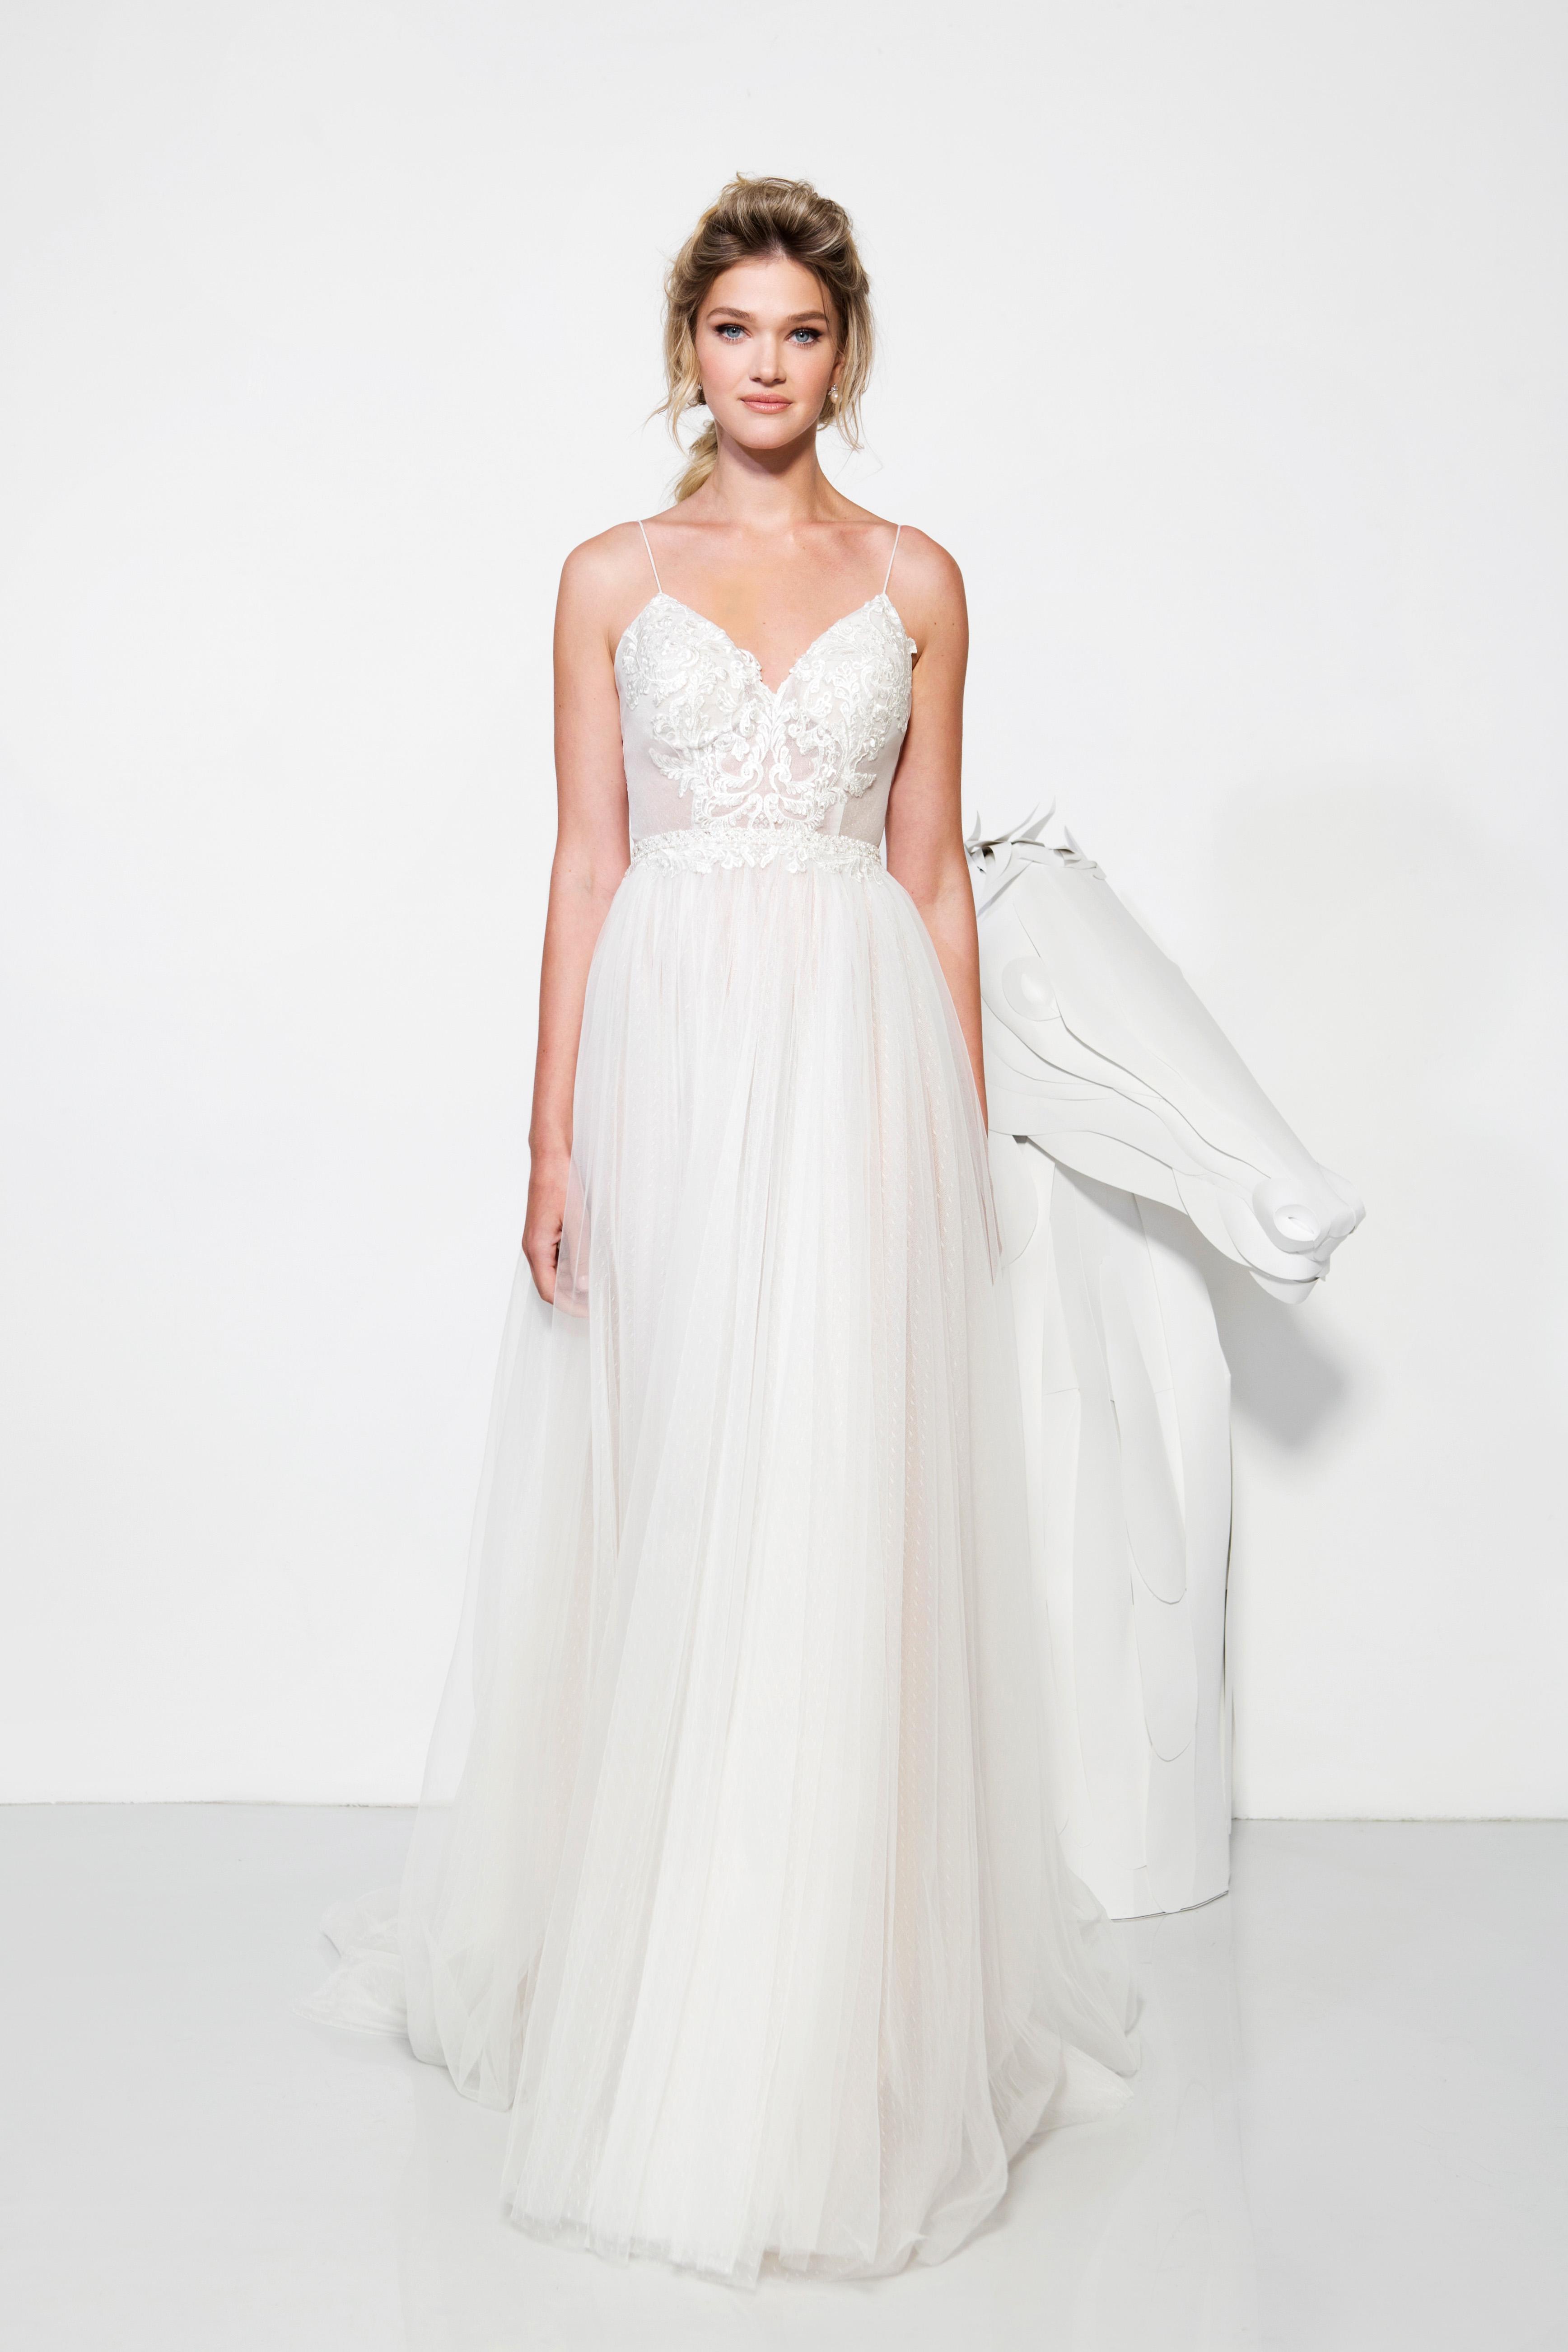 lavish by yaniv persy wedding dress spring 2019 spaghetti straps a-line tulle